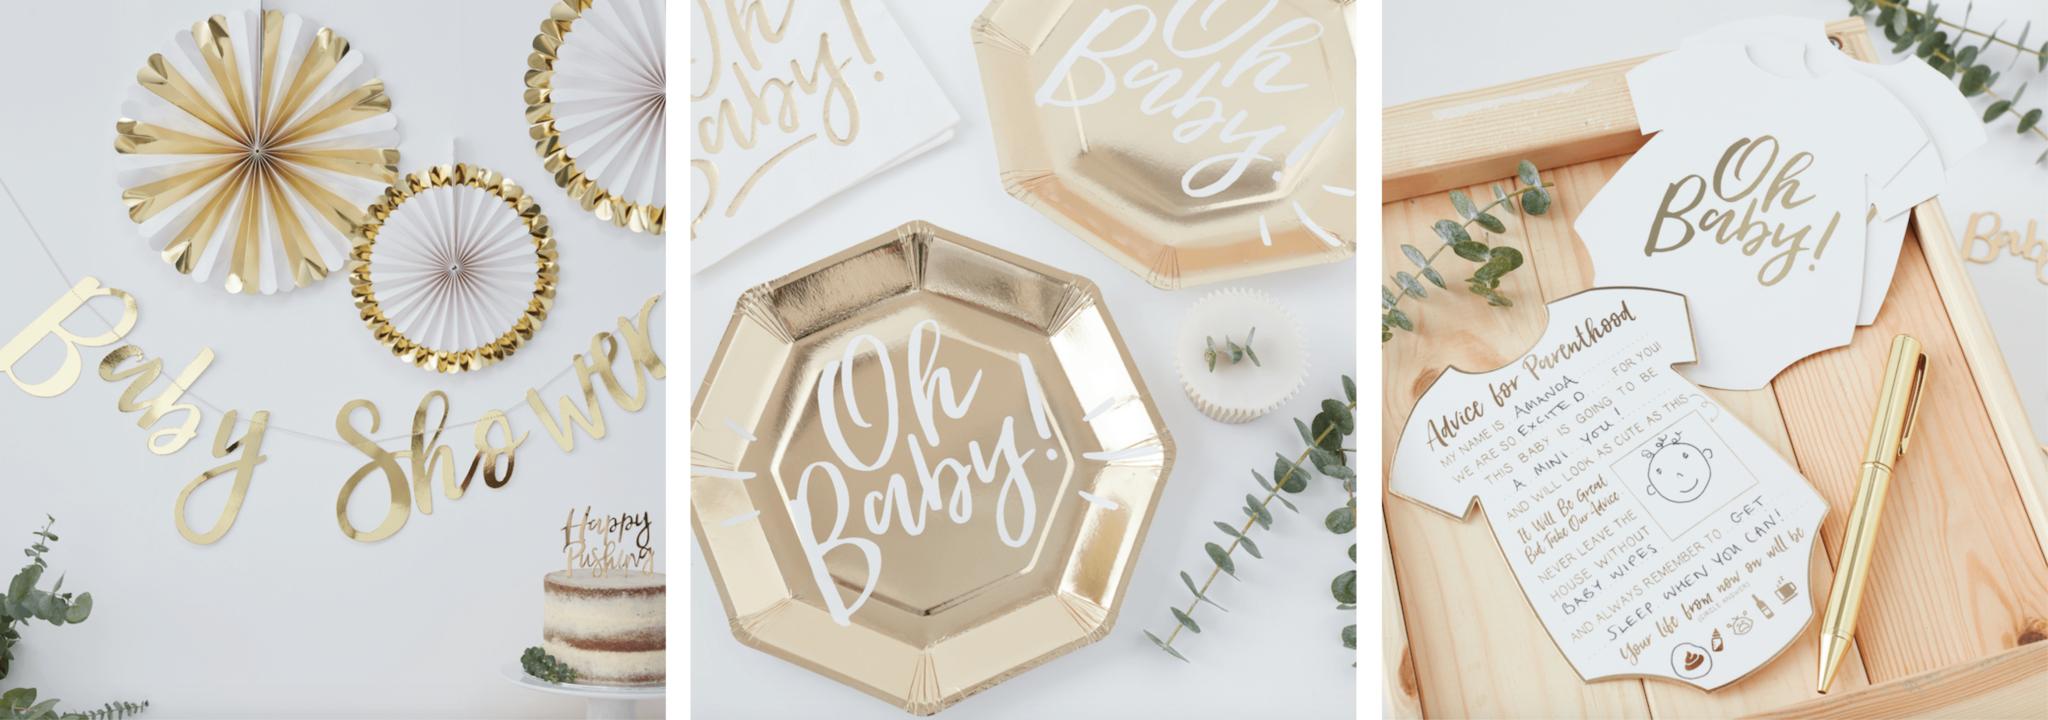 Babyshower versiering goud